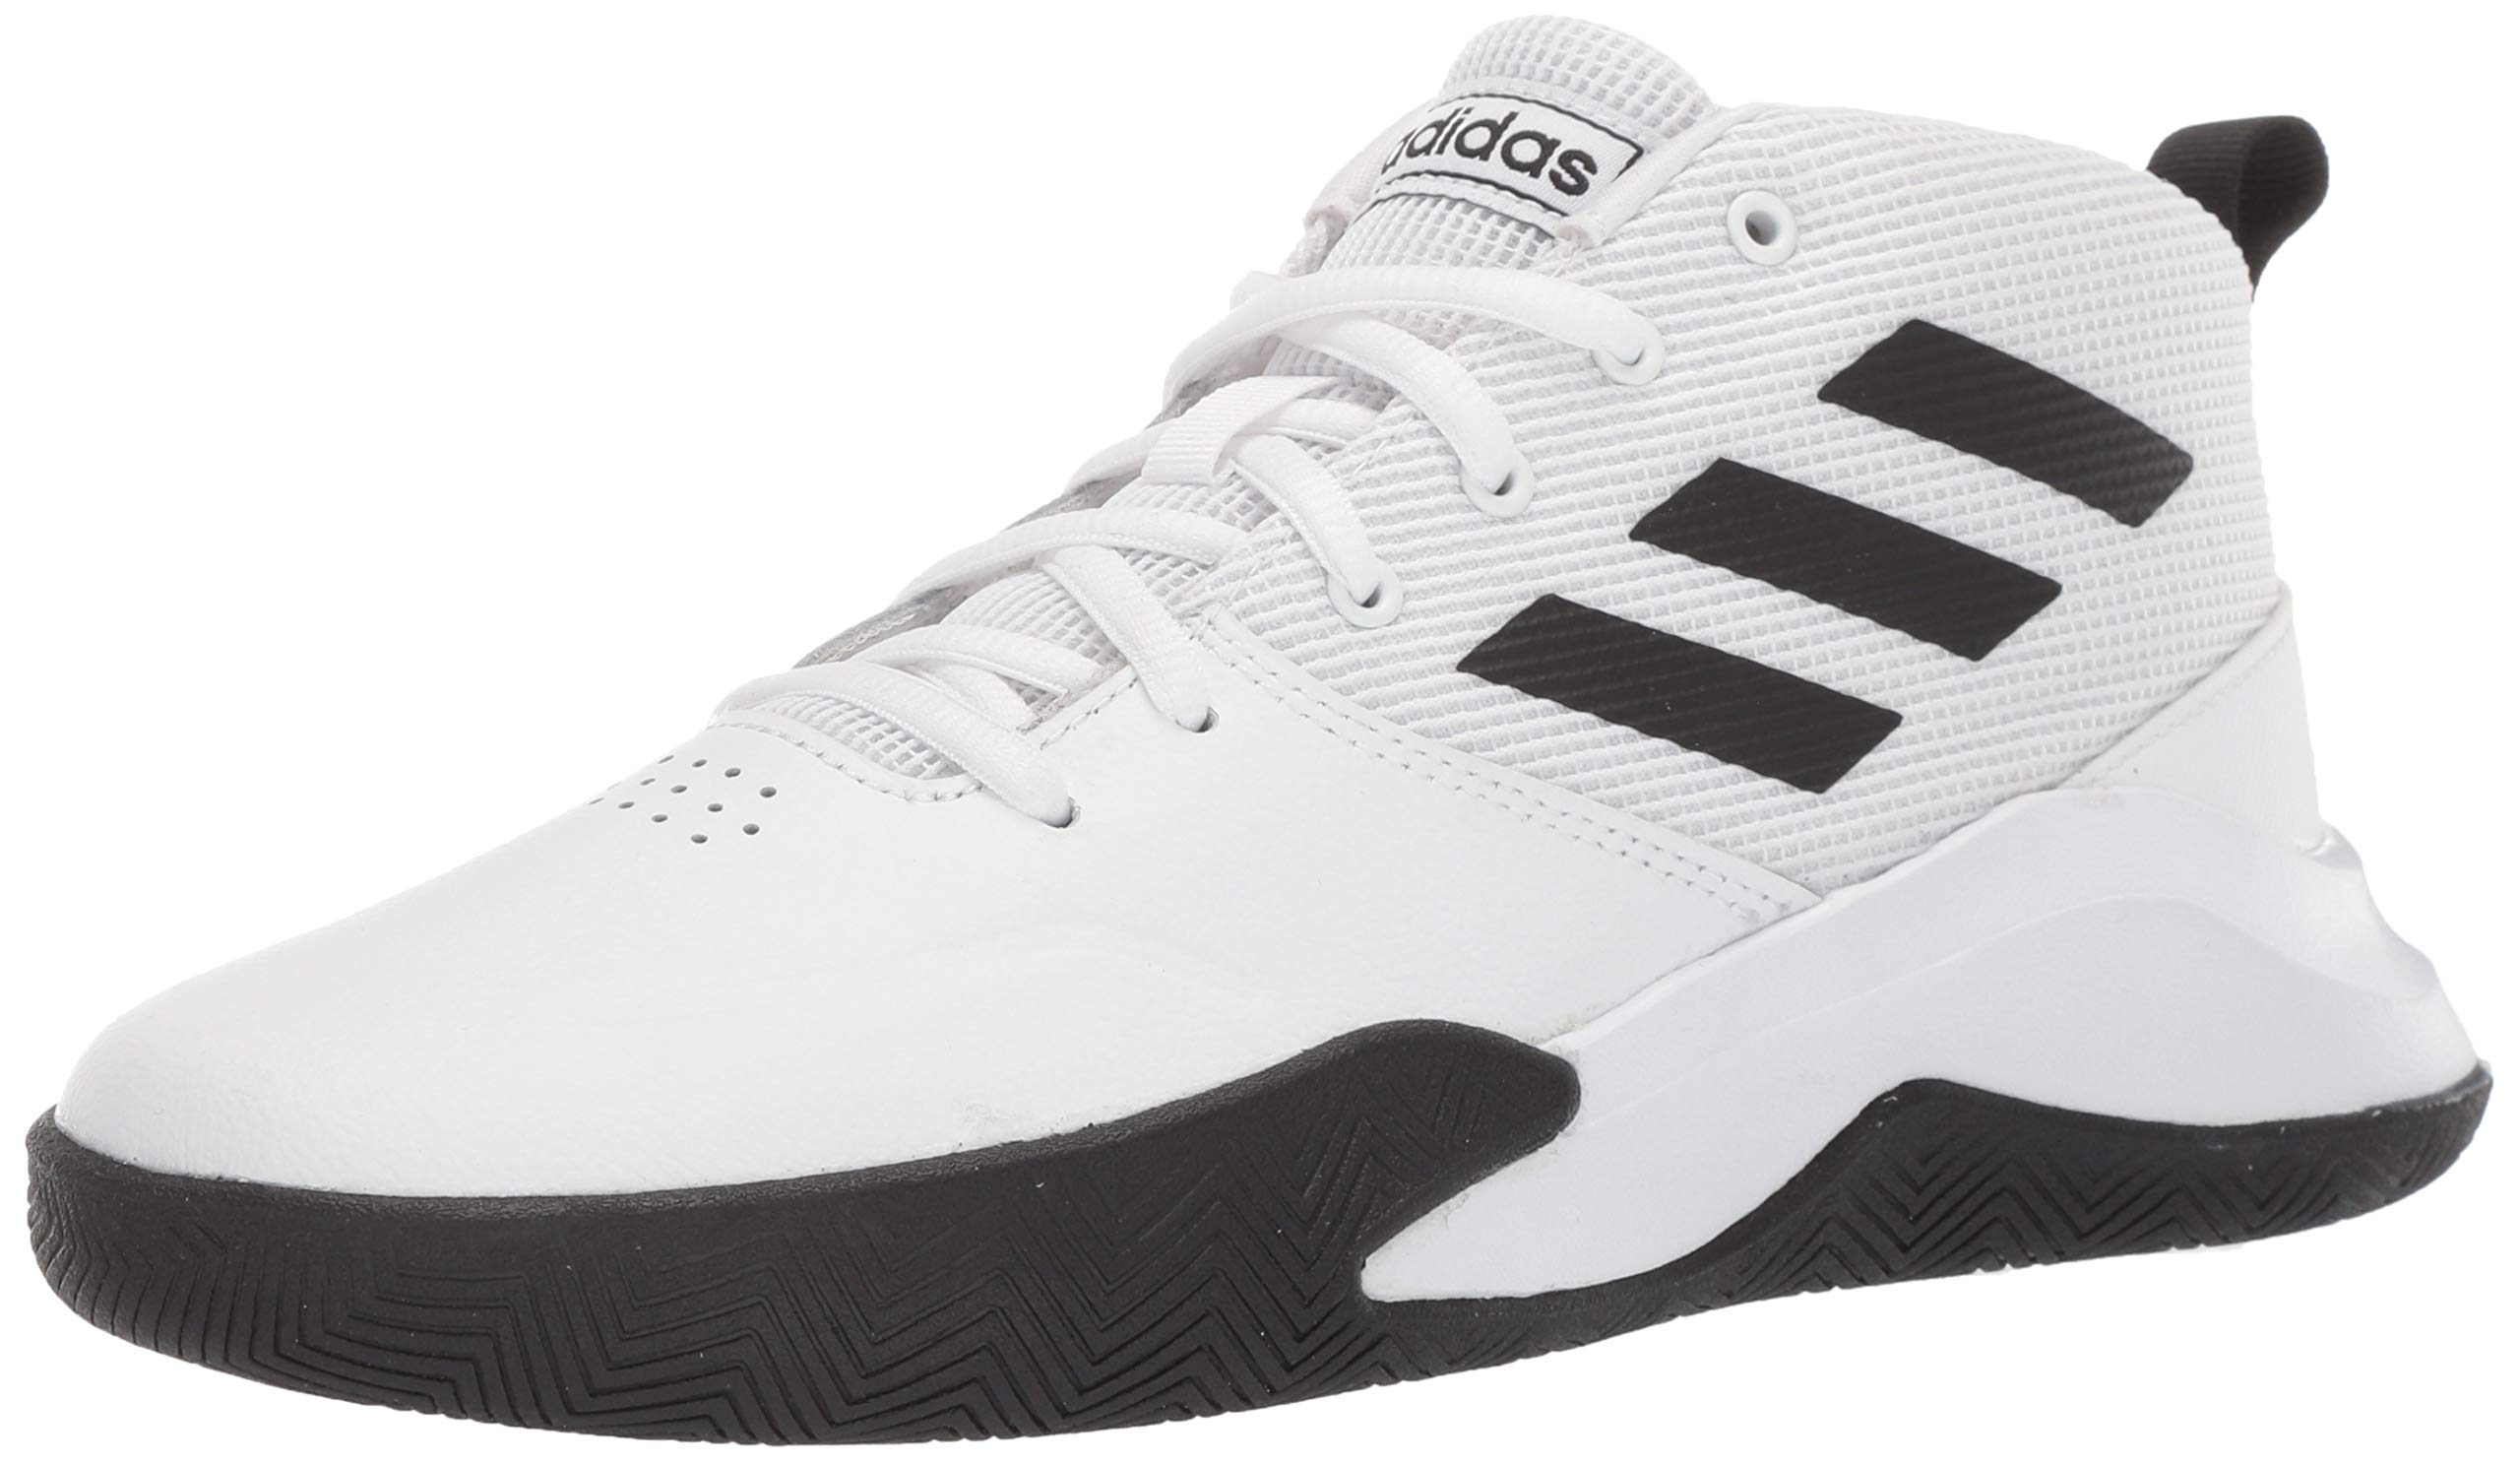 adidas Unisex OwnTheGame Wide Basketball Shoe, Black/White, 5.5 W US Big Kid